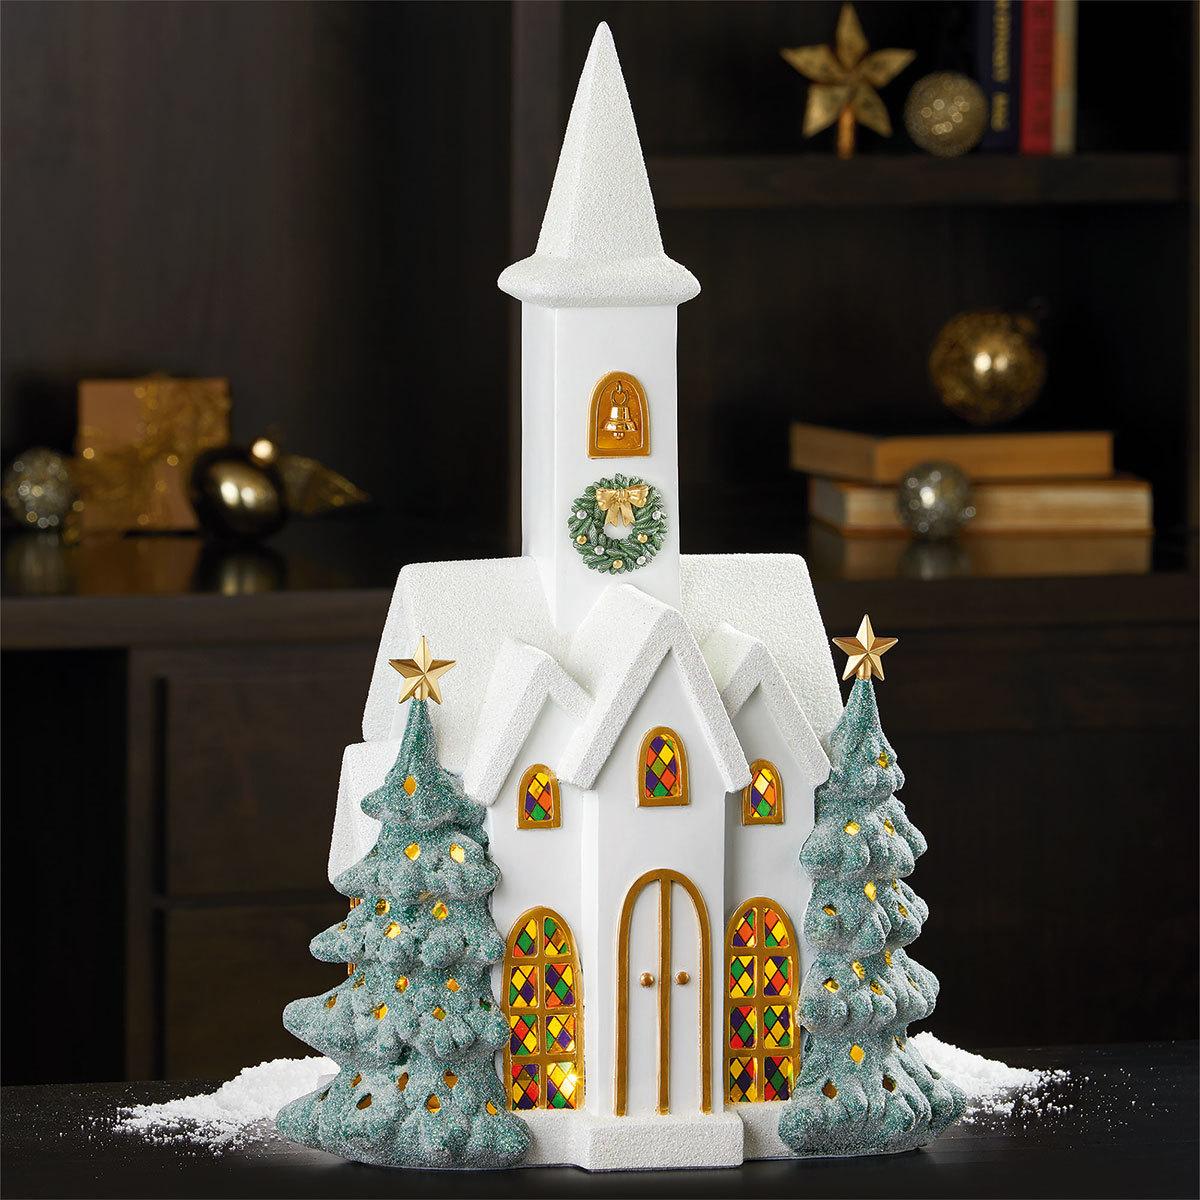 22 55 8 Cm Led Snowy Church Christmas Decoration Costco Uk